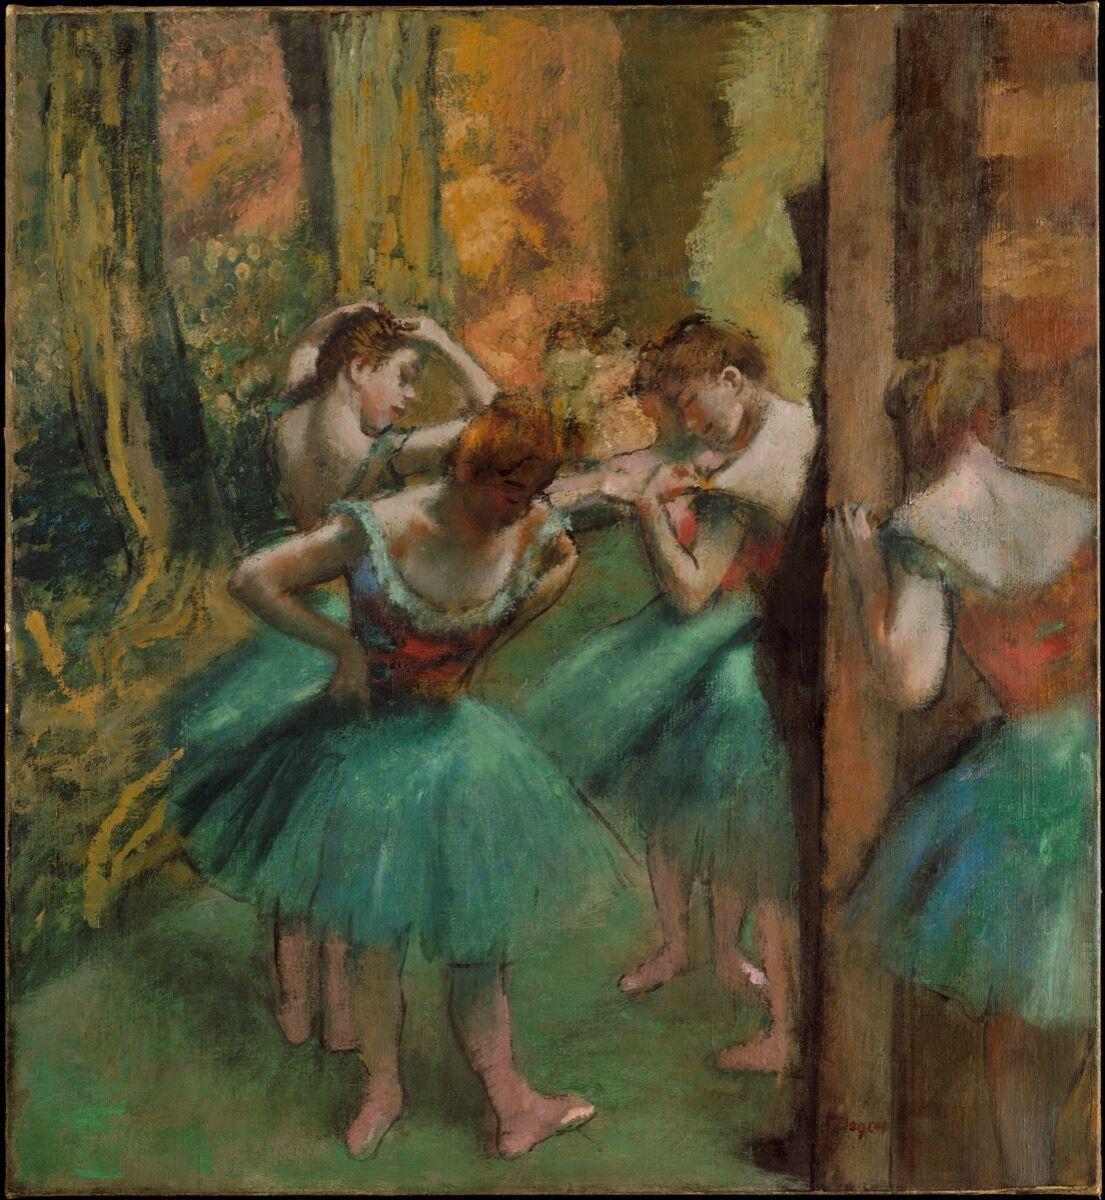 Edgar Degas, Dancers, Pink and Green, ca. 1890. Courtesy of the Metropolitan Museum of Art.